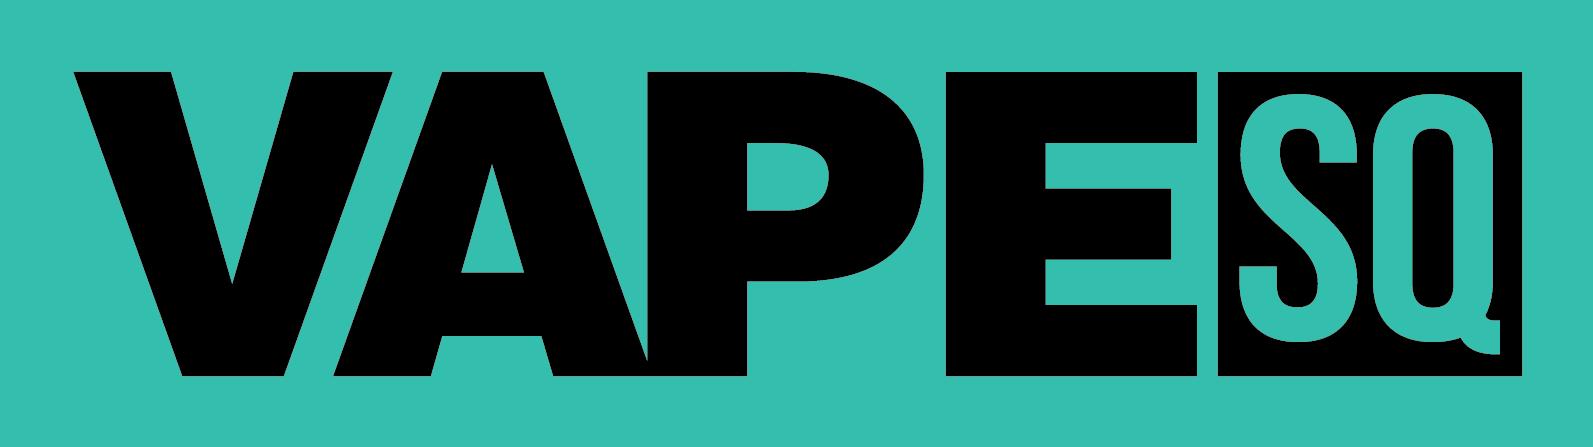 Vape Logo Aqua Box and Black.png